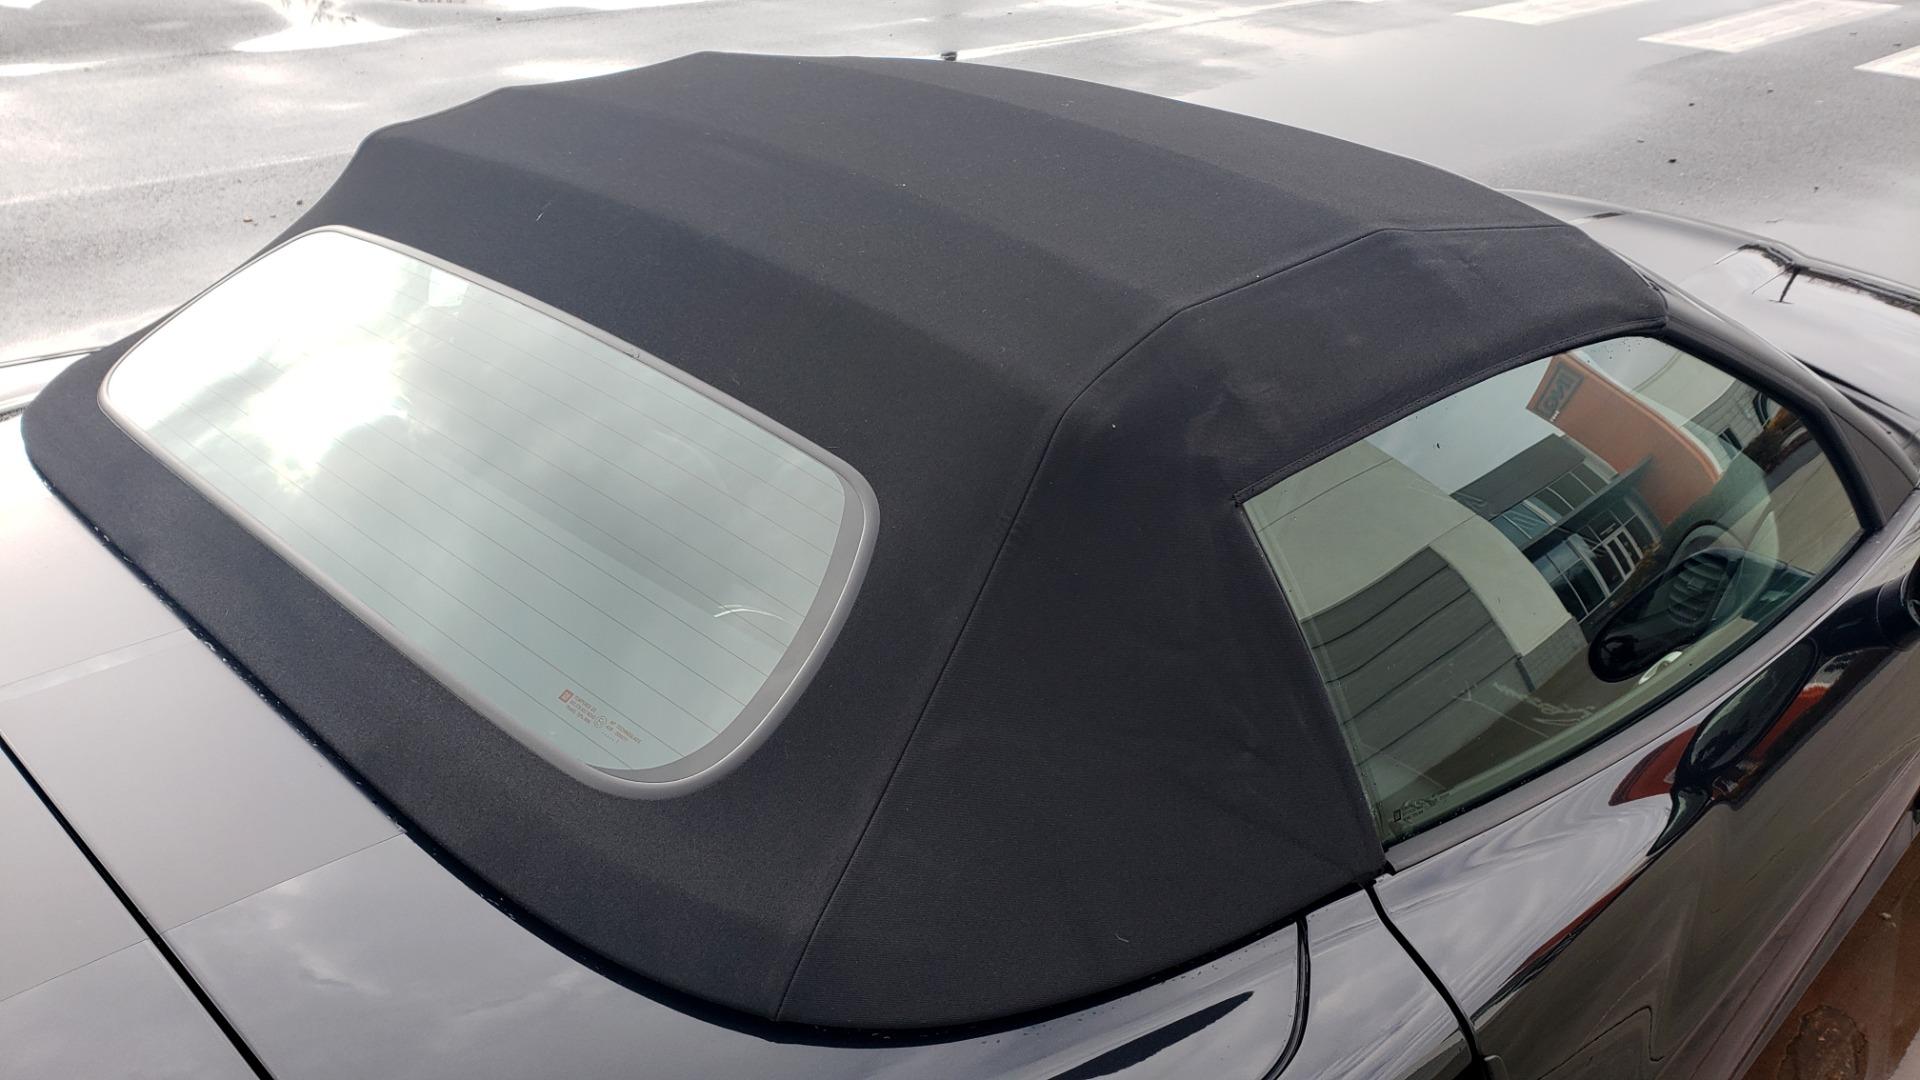 Used 2012 Chevrolet CORVETTE Z16 GRAND SPORT 3LT CONVERTIBLE / 6-SPD AUTO / NAV for sale $38,990 at Formula Imports in Charlotte NC 28227 13